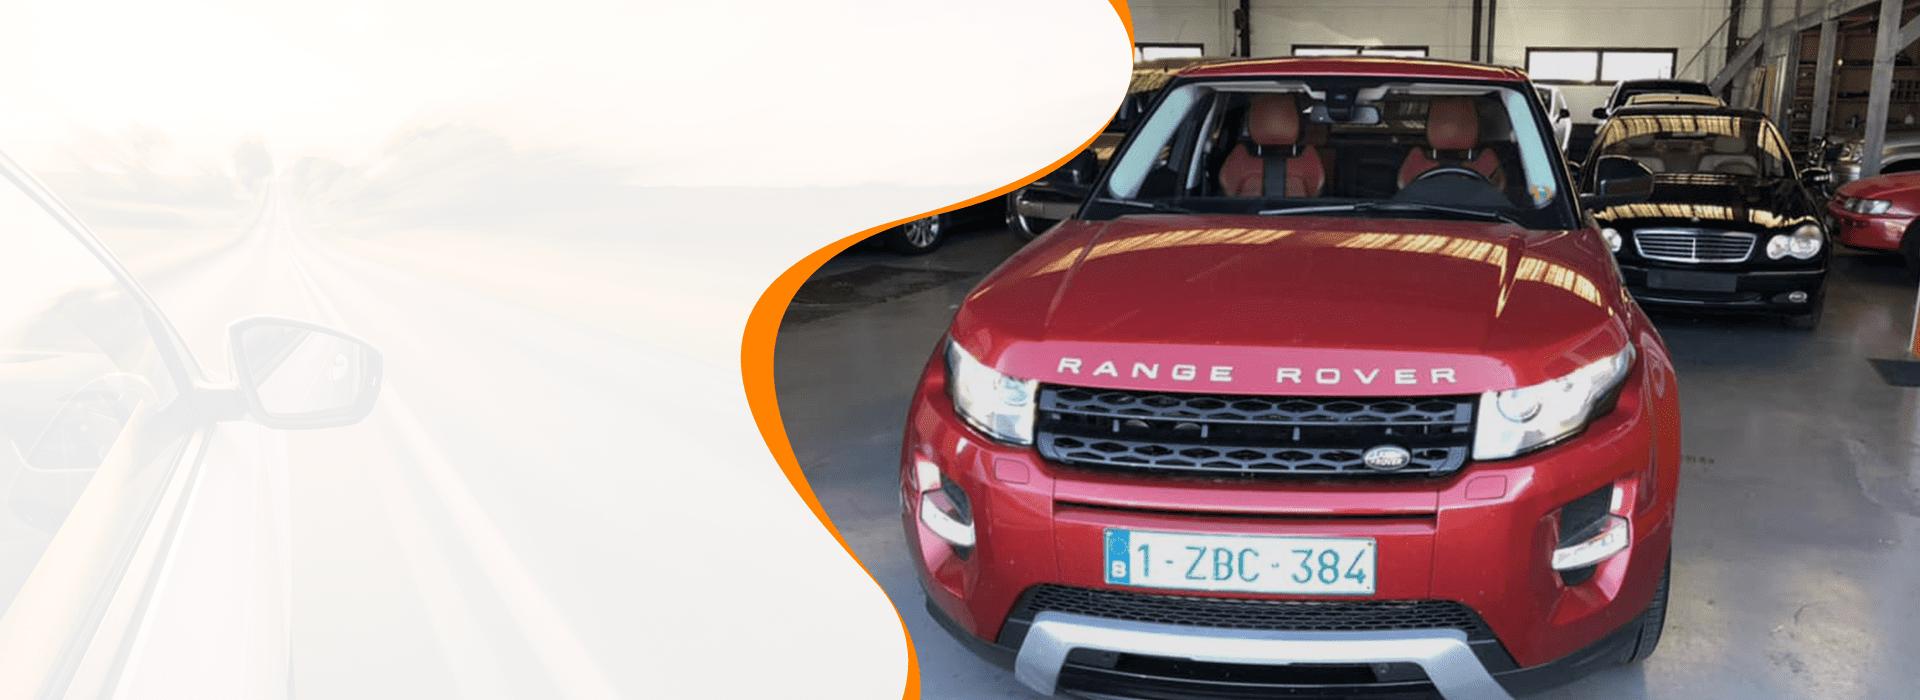 slider-achat-vente-voitures-occasion-Bruxelles-Capitale